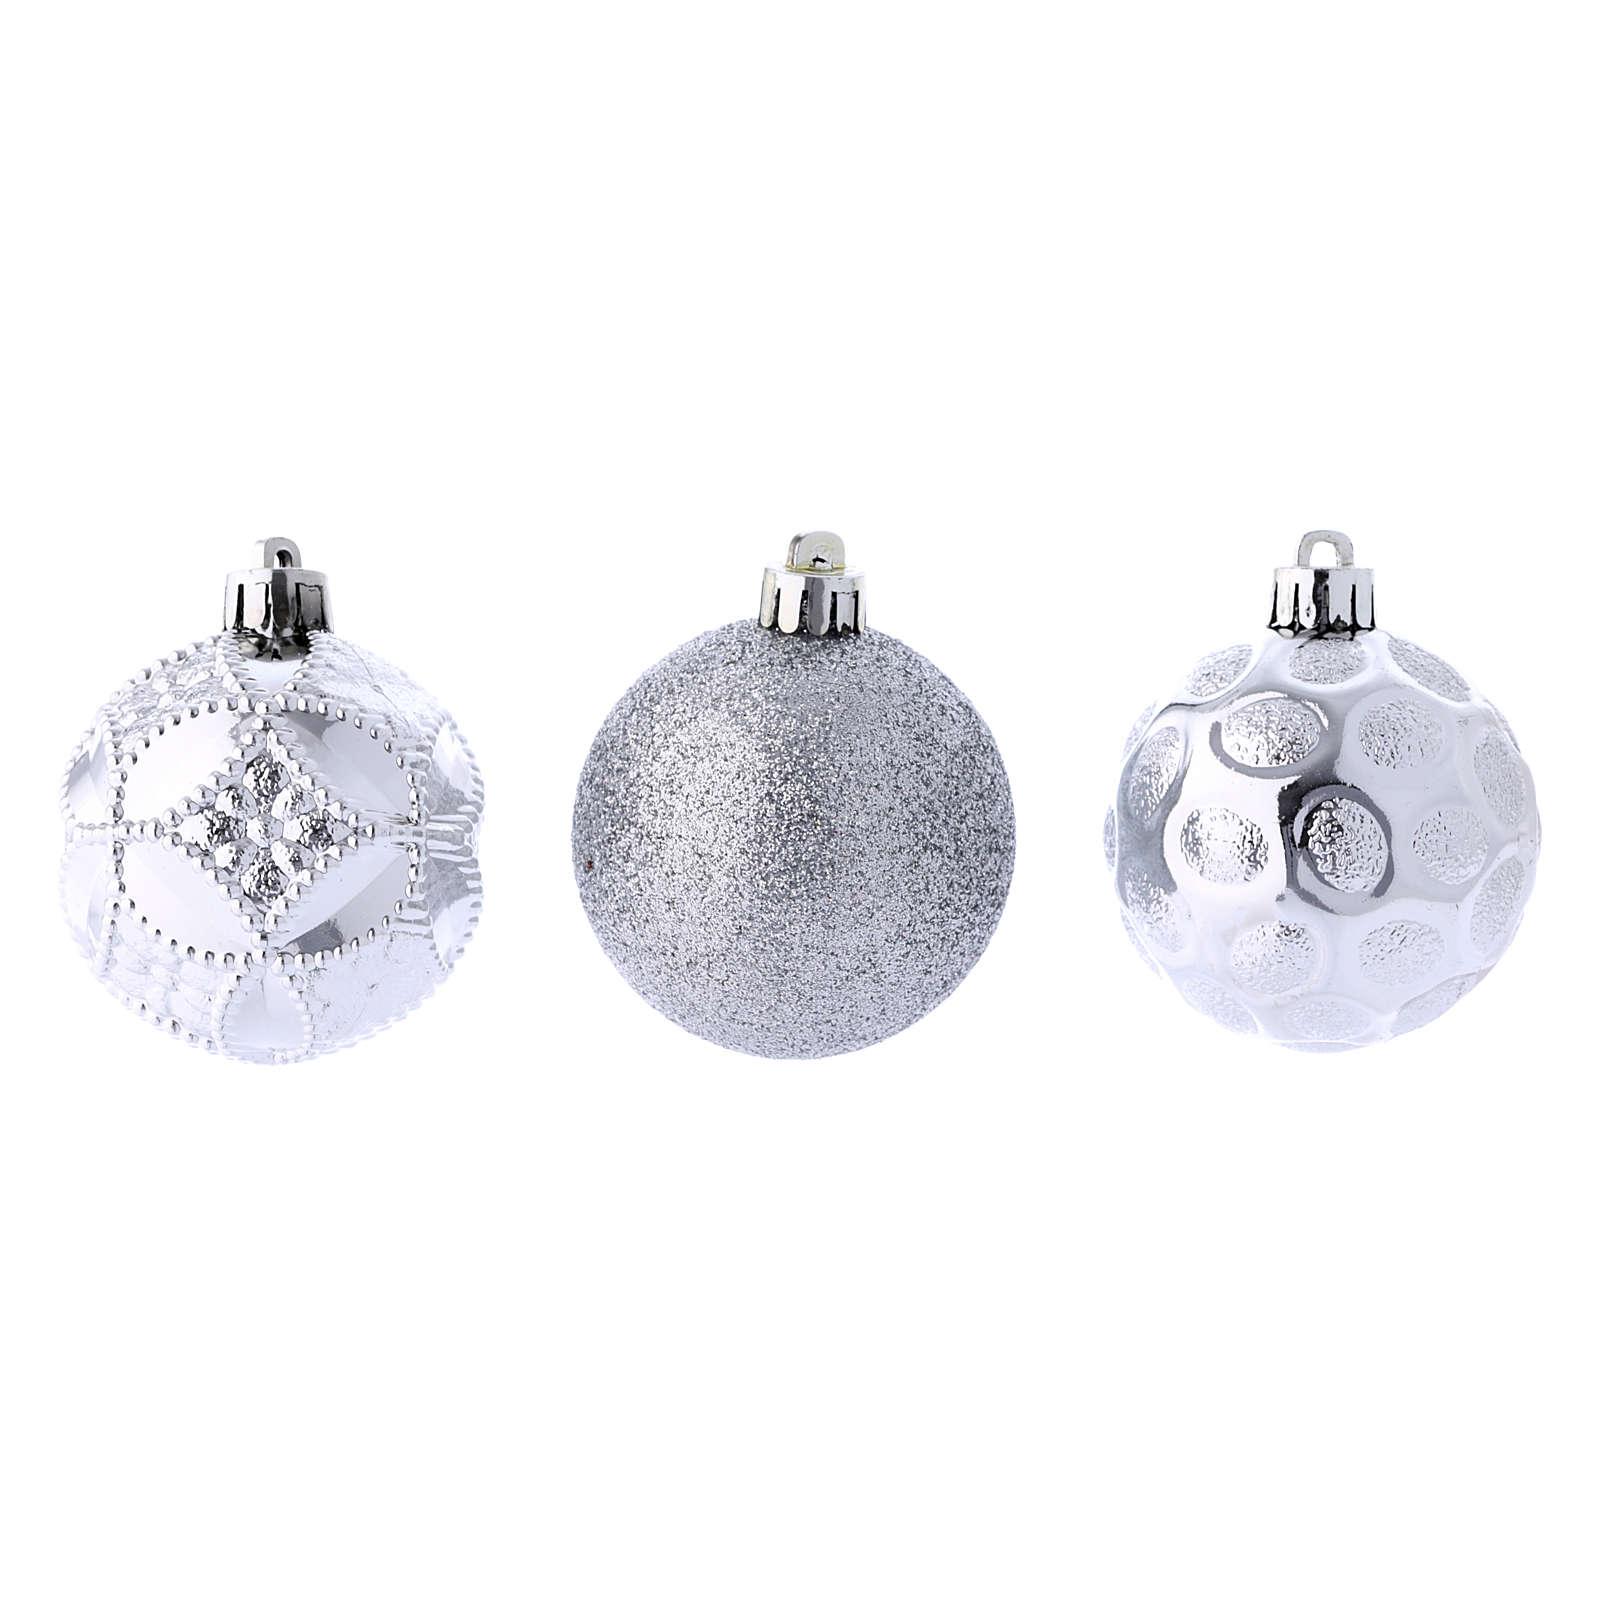 Pallina Albero Natale argento 60 mm 4